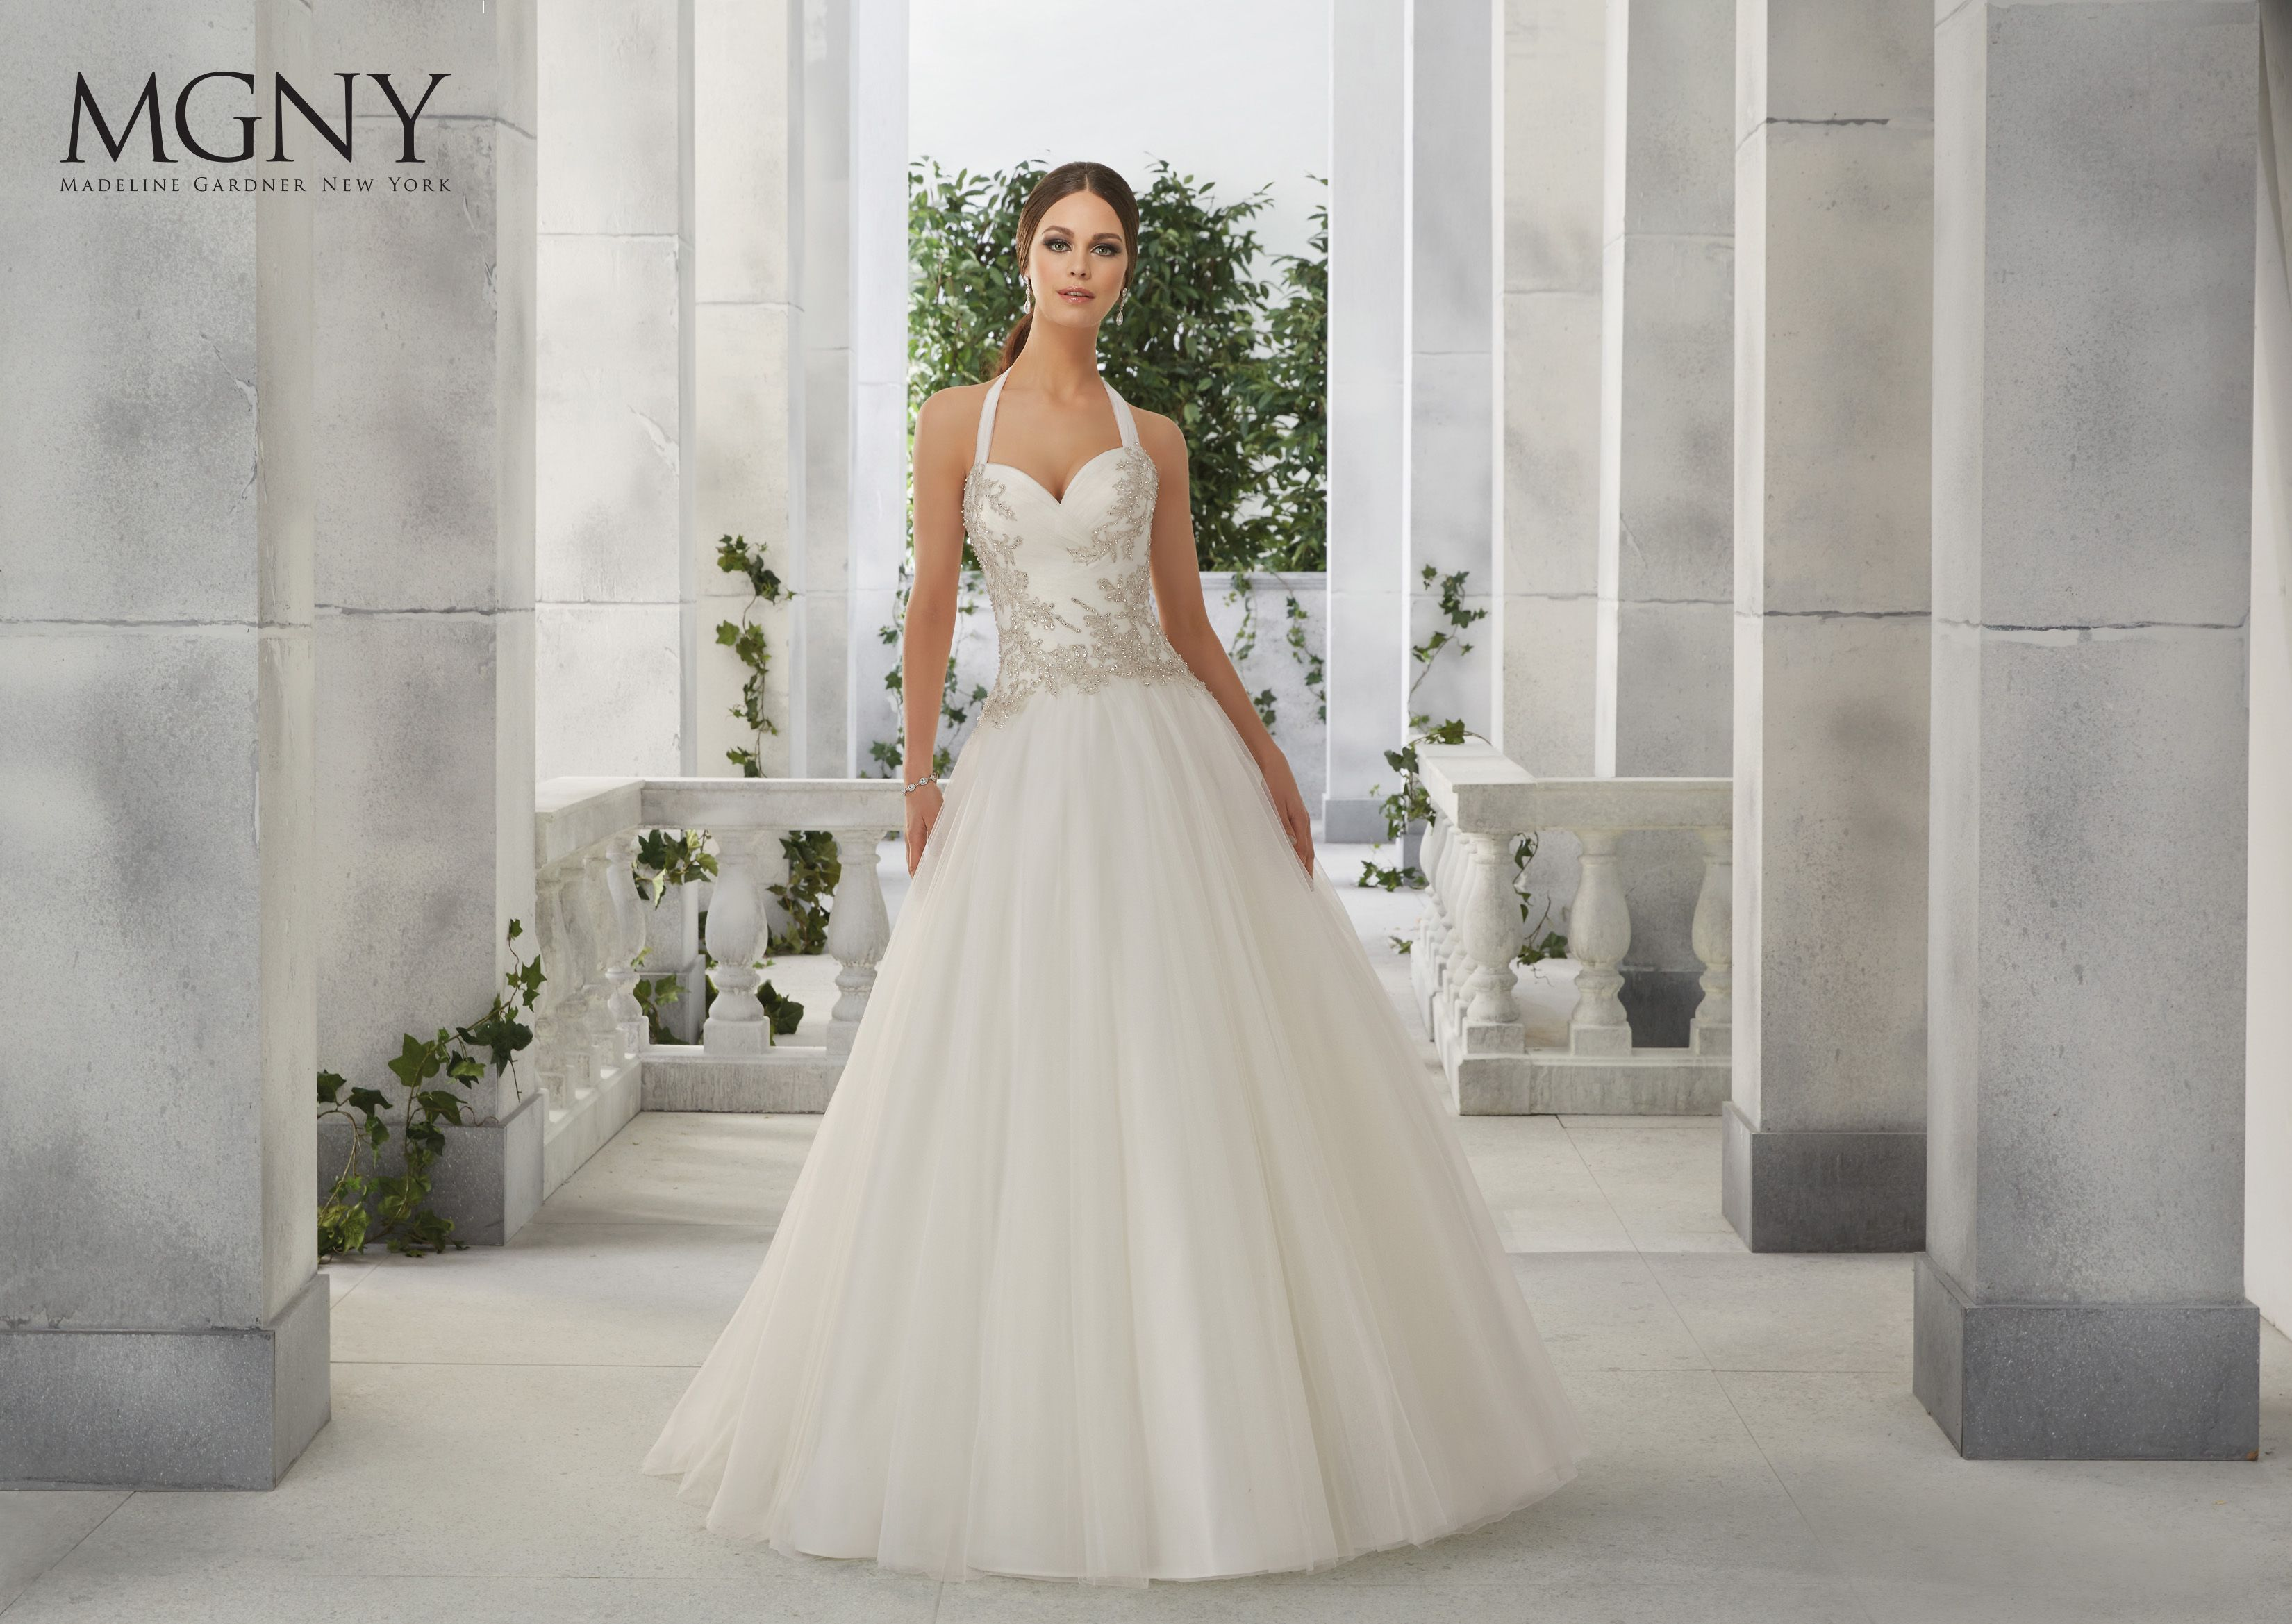 New 2017 Mgny dress | mgny wedding dresses | Pinterest | Wedding ...